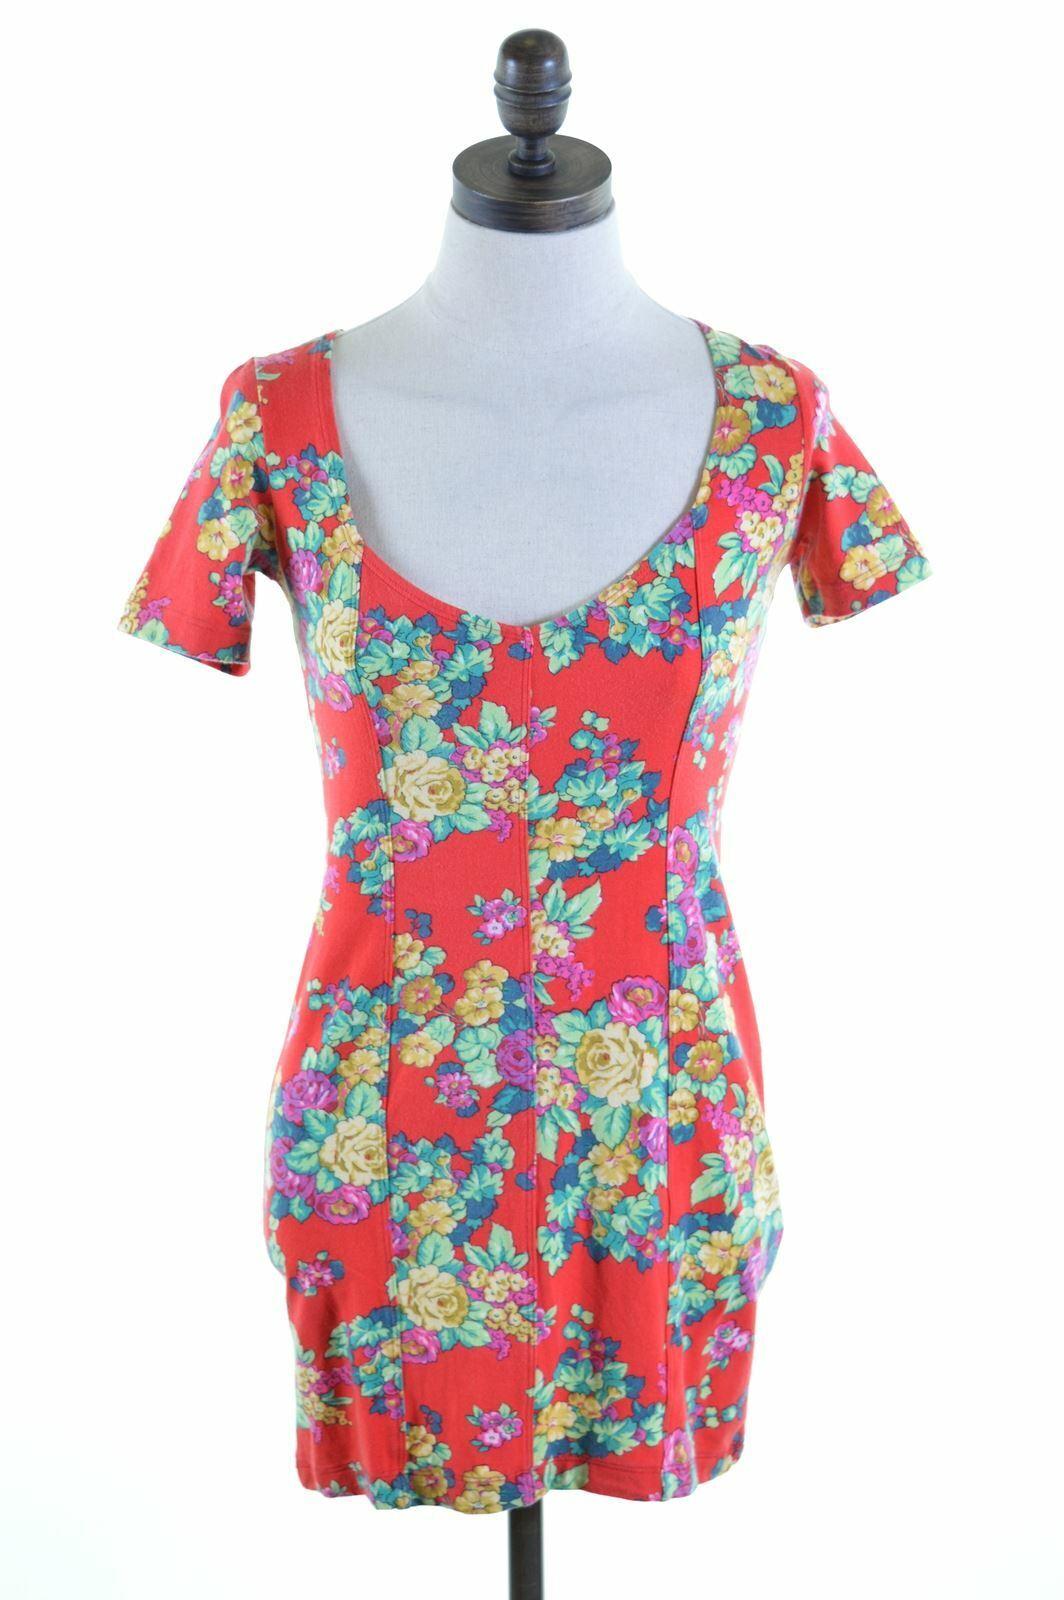 KENZO damen Bodycon Dress Größe 12 Medium Multi Floral Cotton  KM42